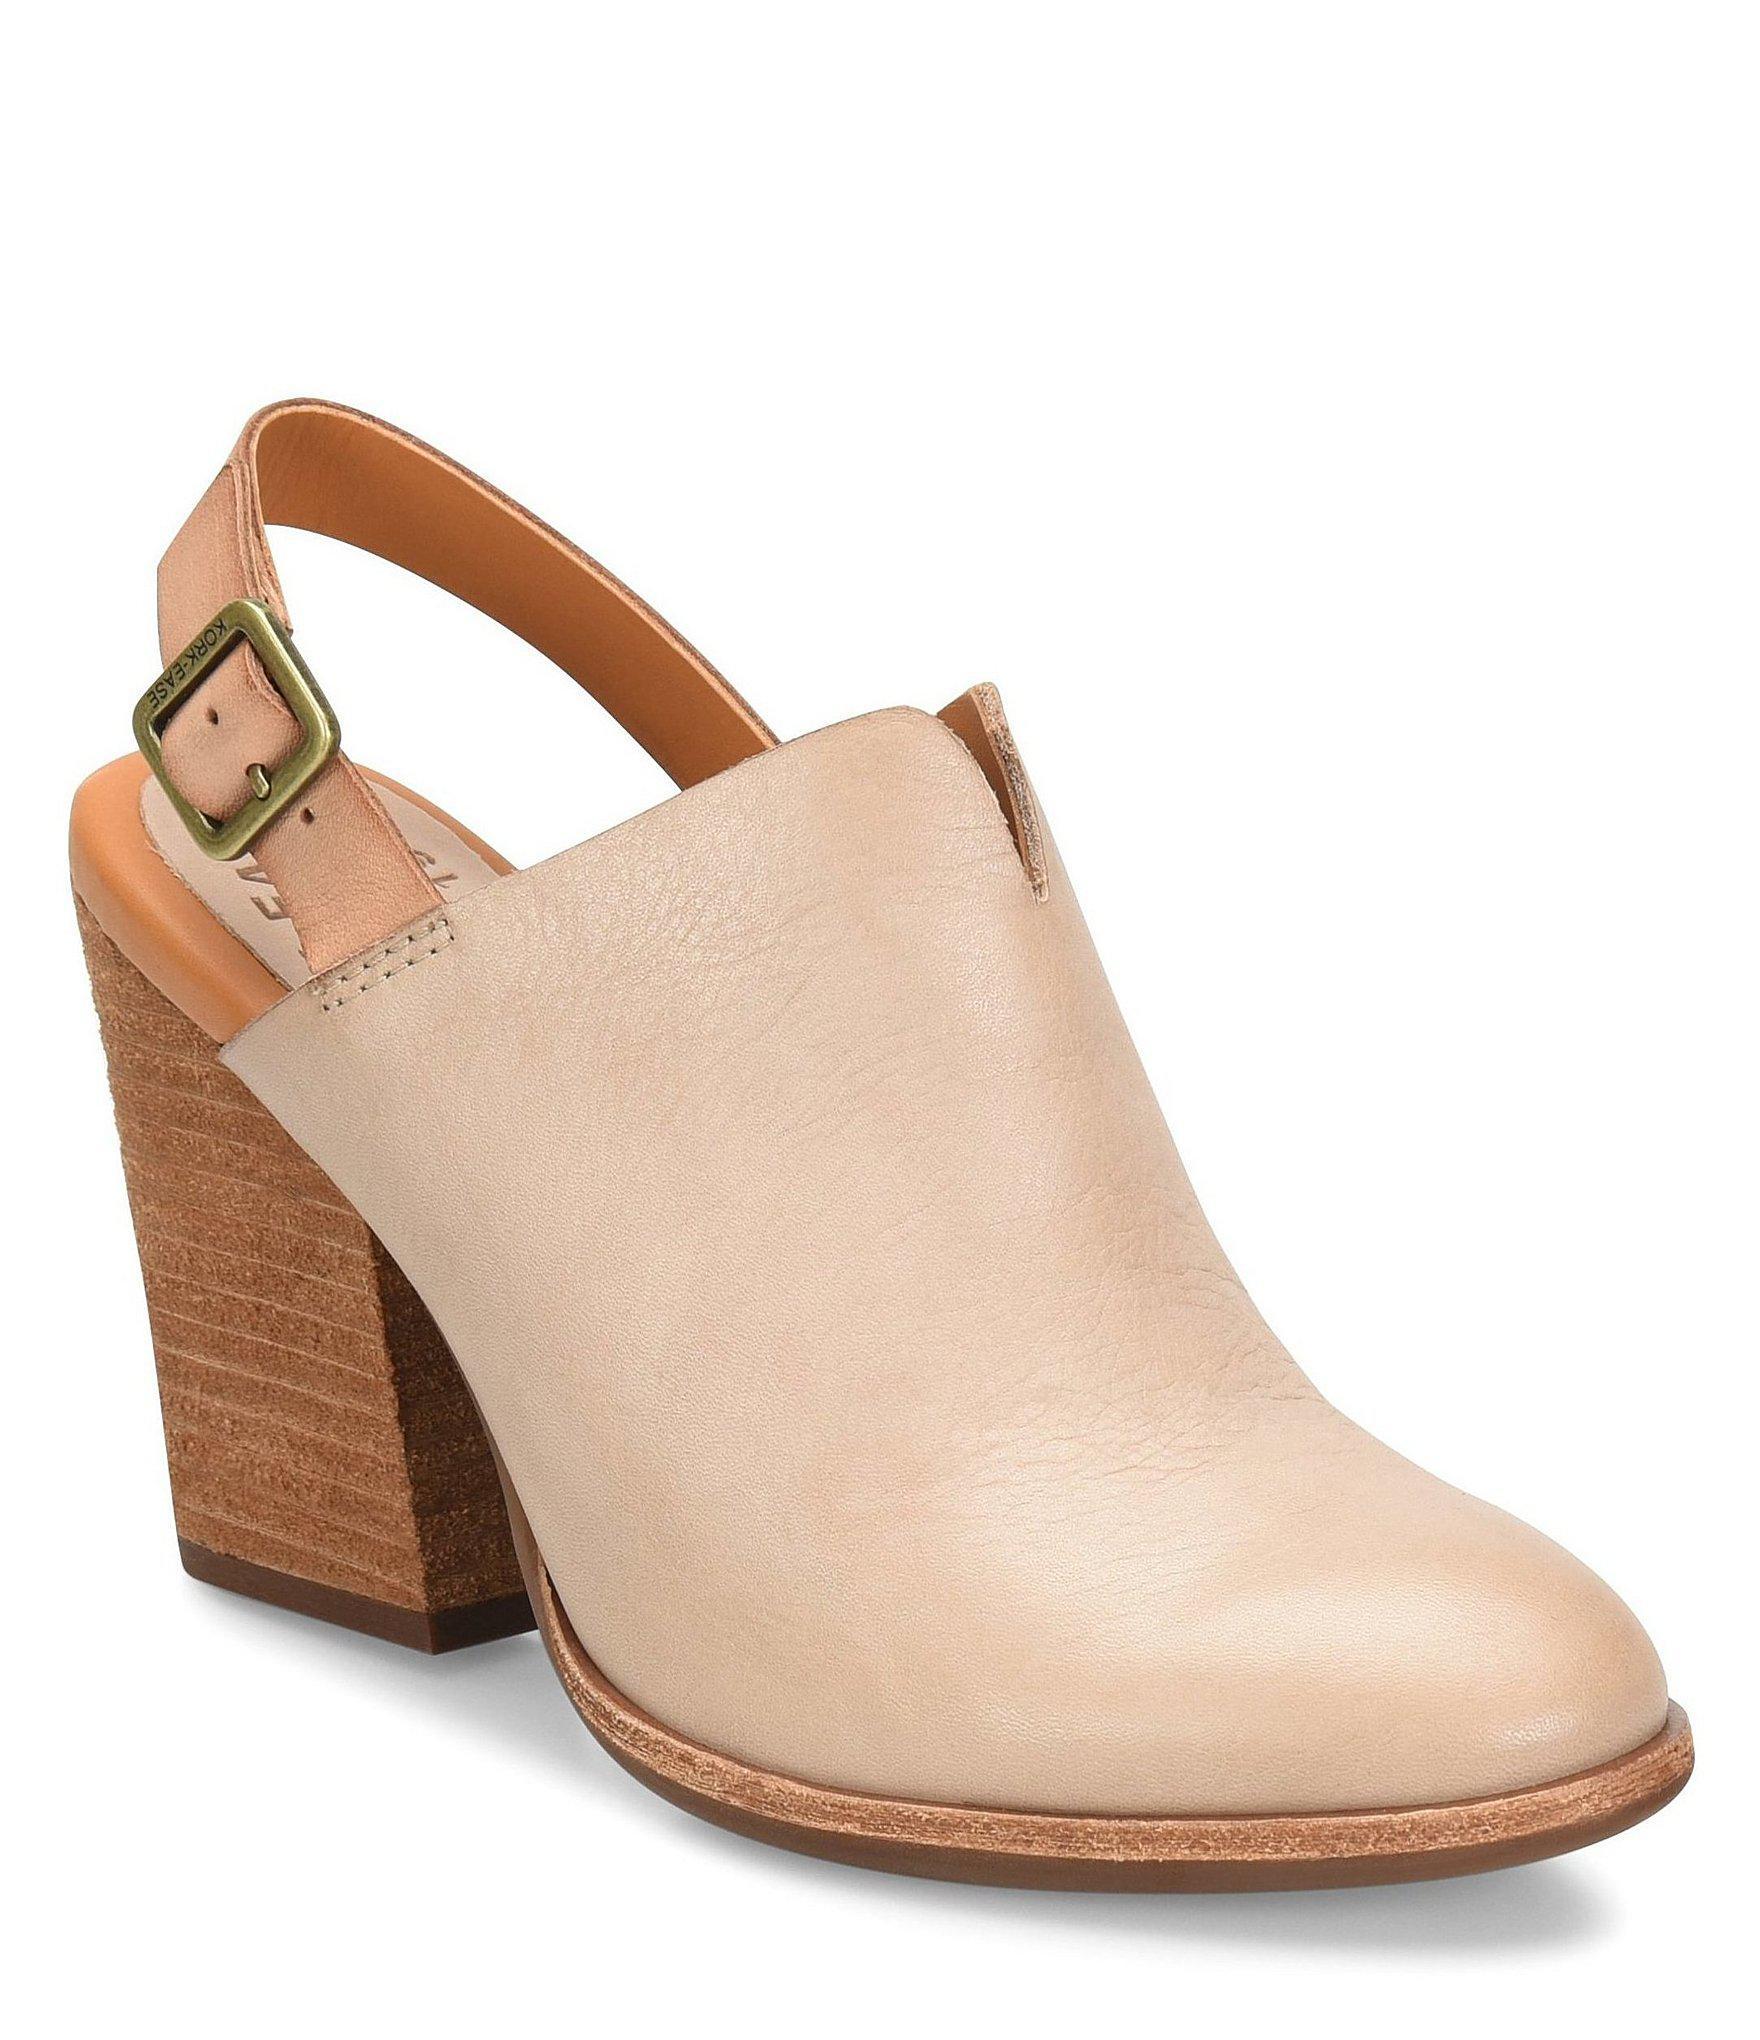 fa69dc75668f Lyst - Kork-Ease Janelle Slingback Block Heel Mules